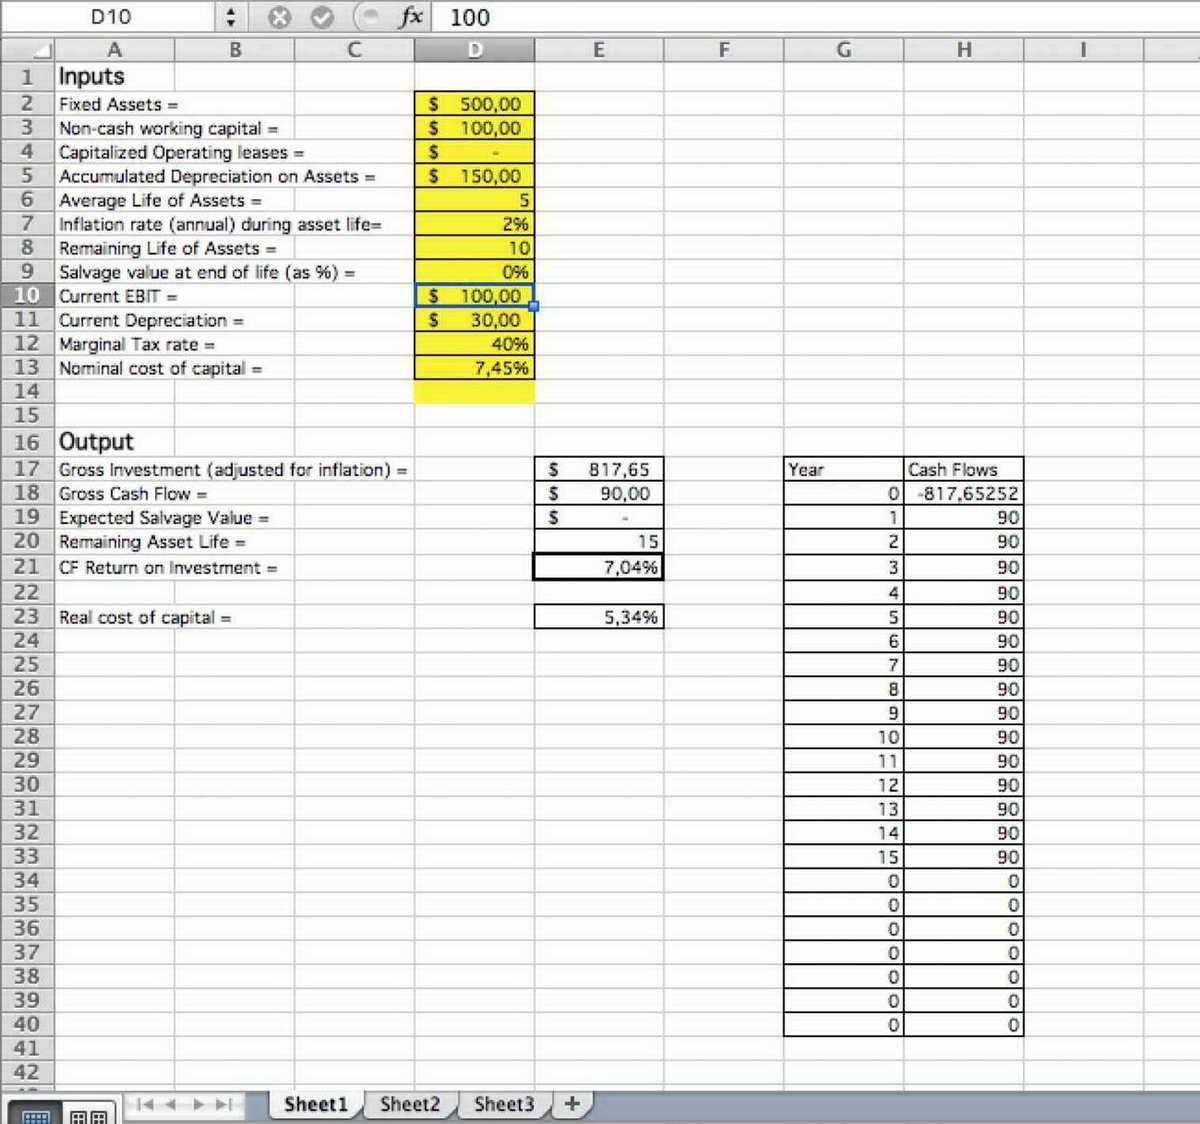 Restaurant Valuation Spreadsheet with regard to Business Valuation Spreadsheet With Discounted Cash Flow Template